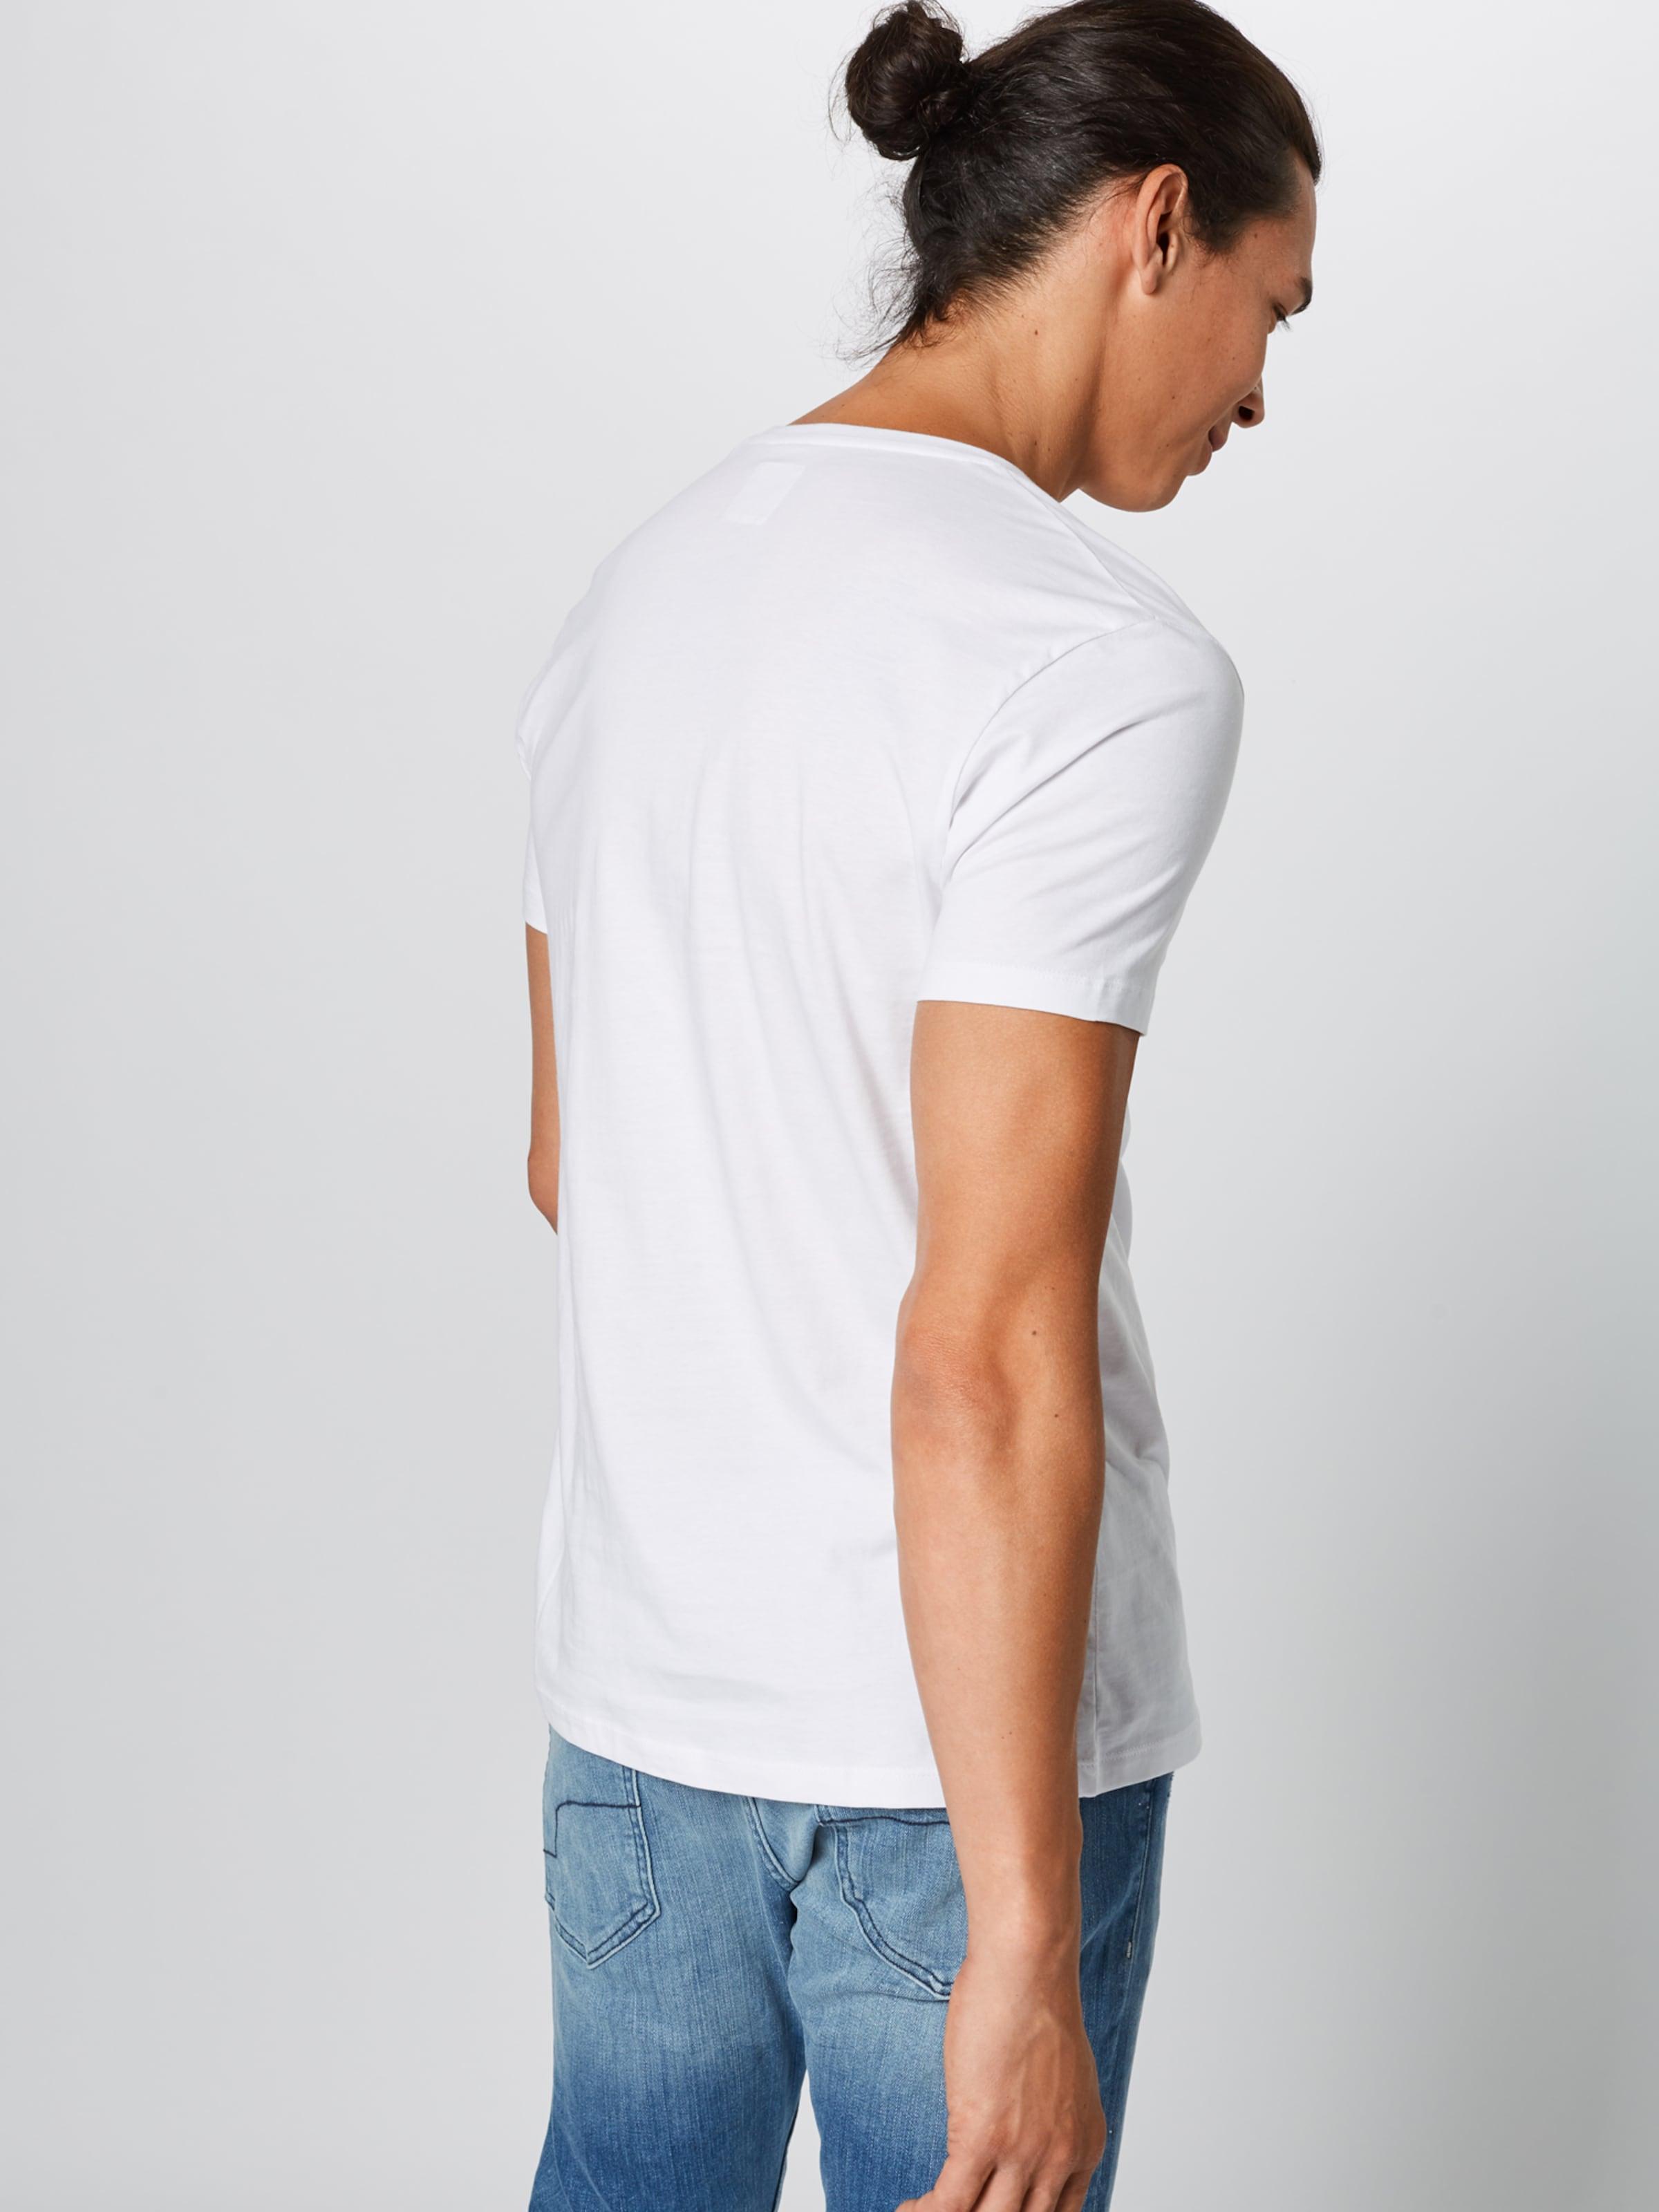 Edc T Blanc Esprit shirt By En rBdxeWCoEQ